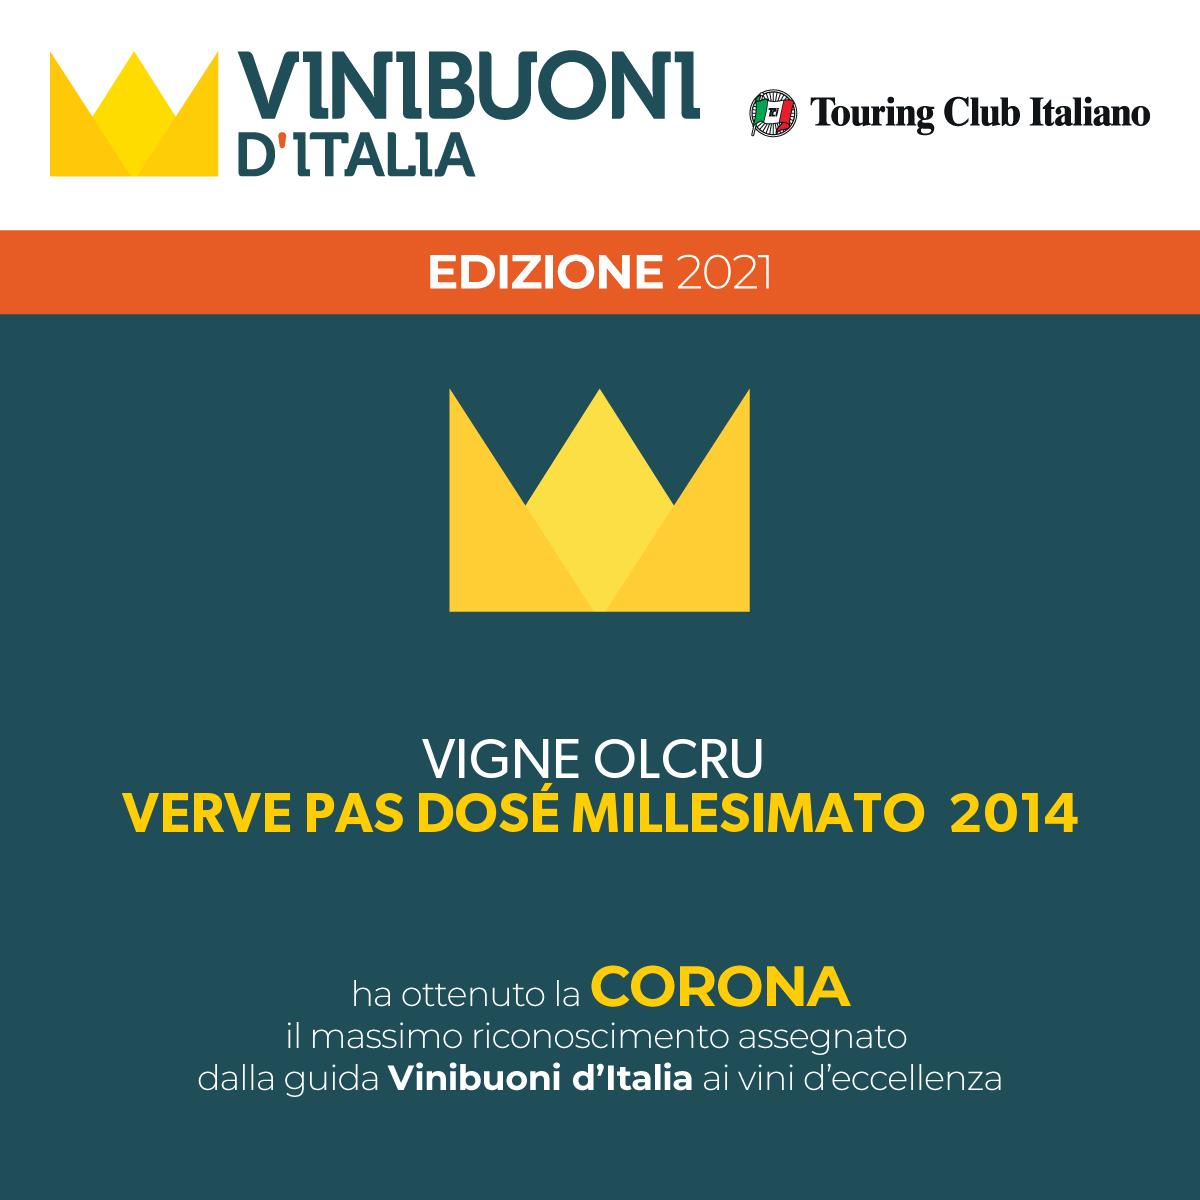 corona-vinibuoni – Verve 2014